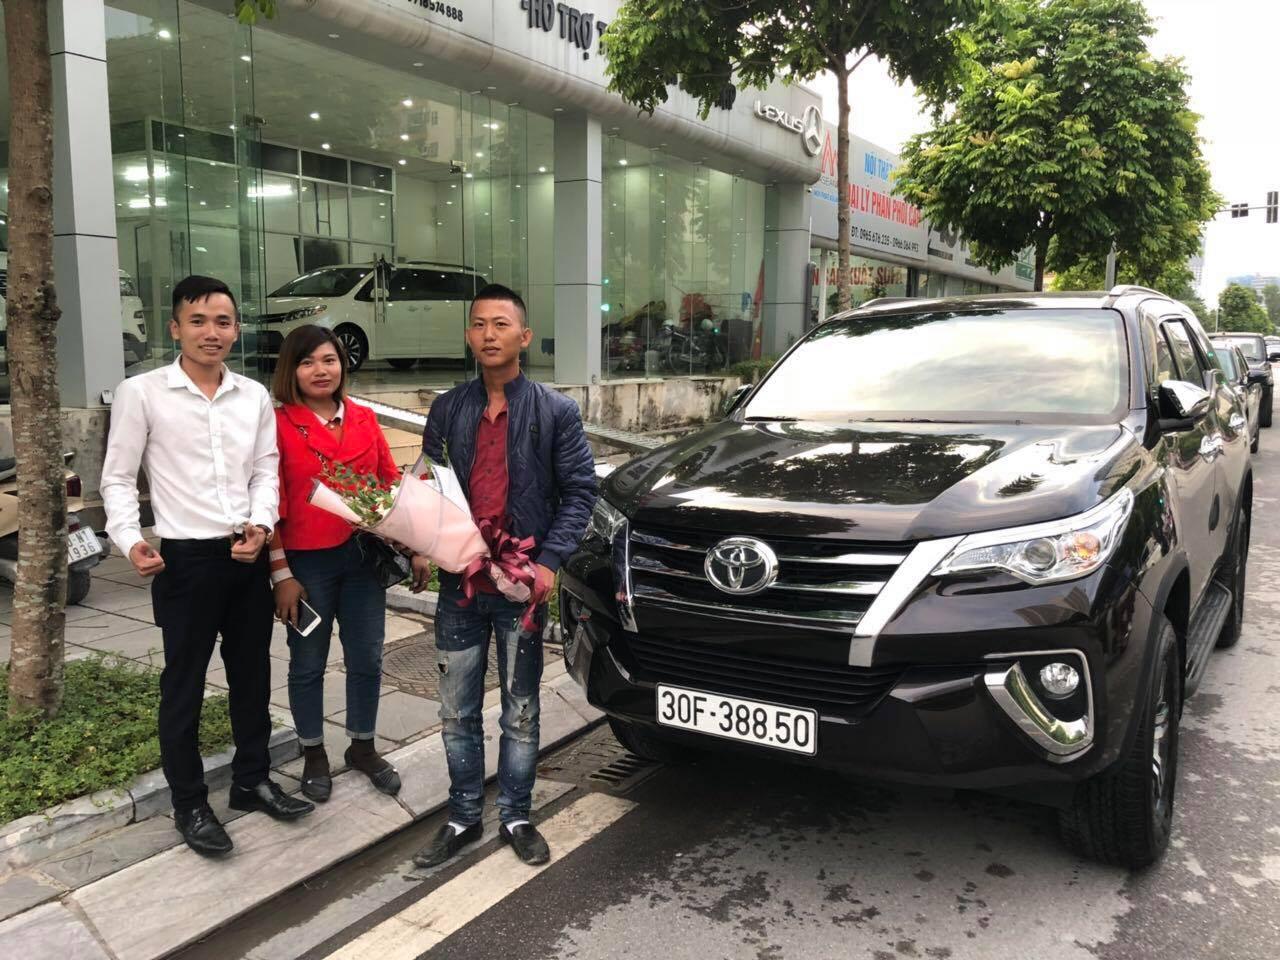 Toyota Fortuner 2018 30F-388.xx